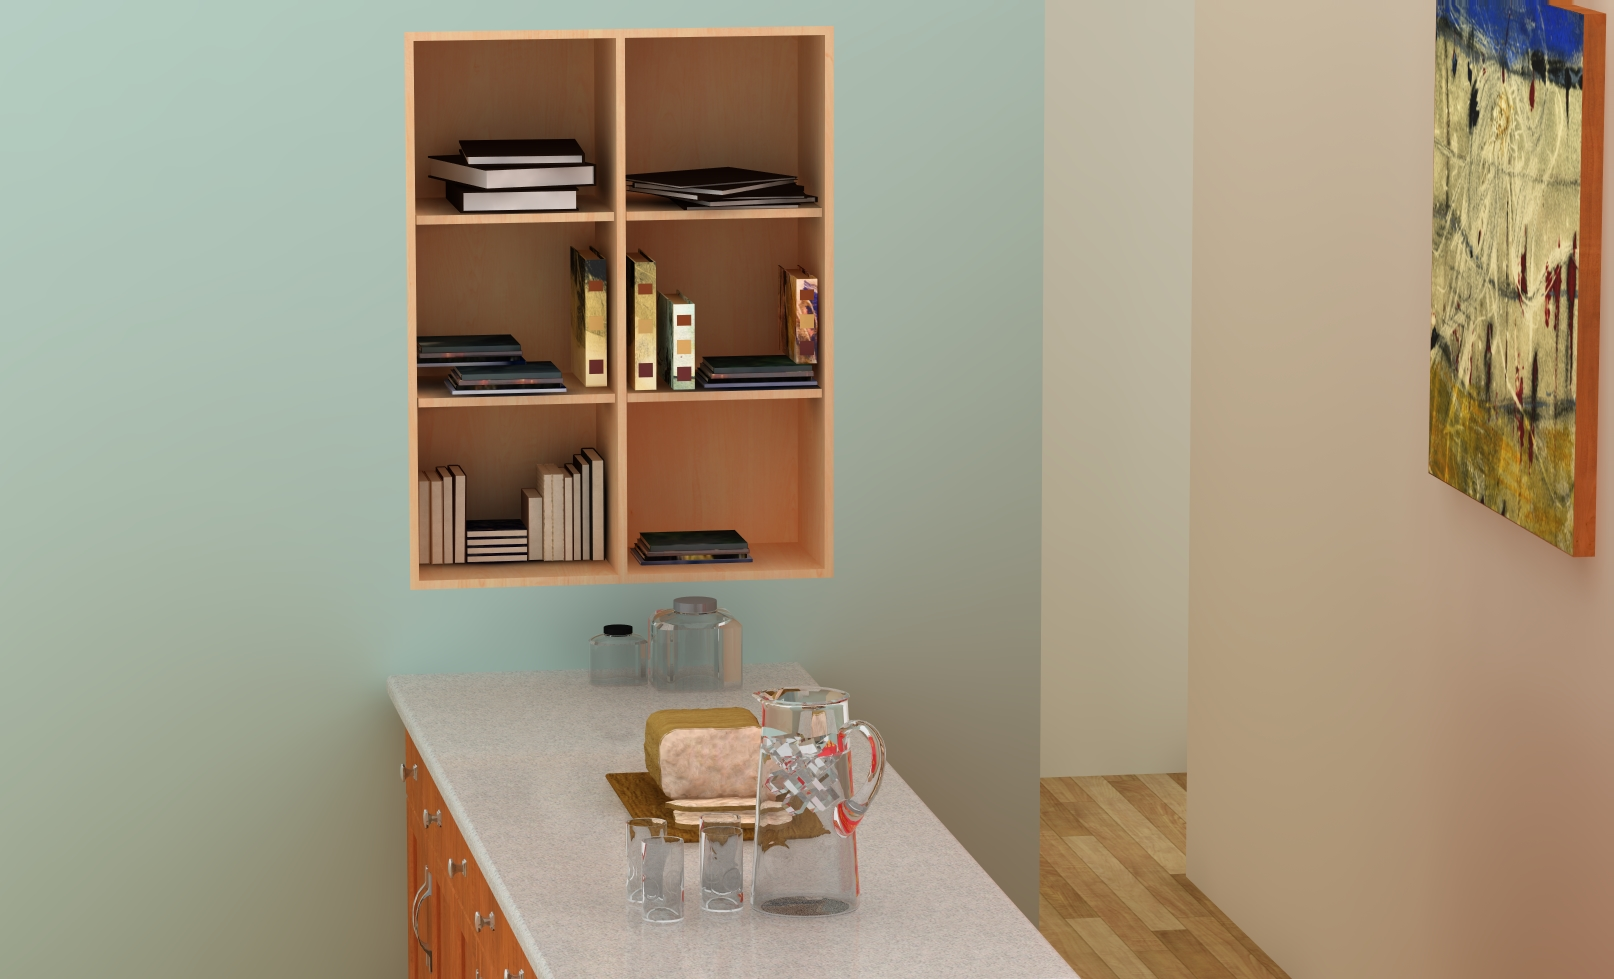 3 Bookshelf Ideas For Your Ikea Kitchen